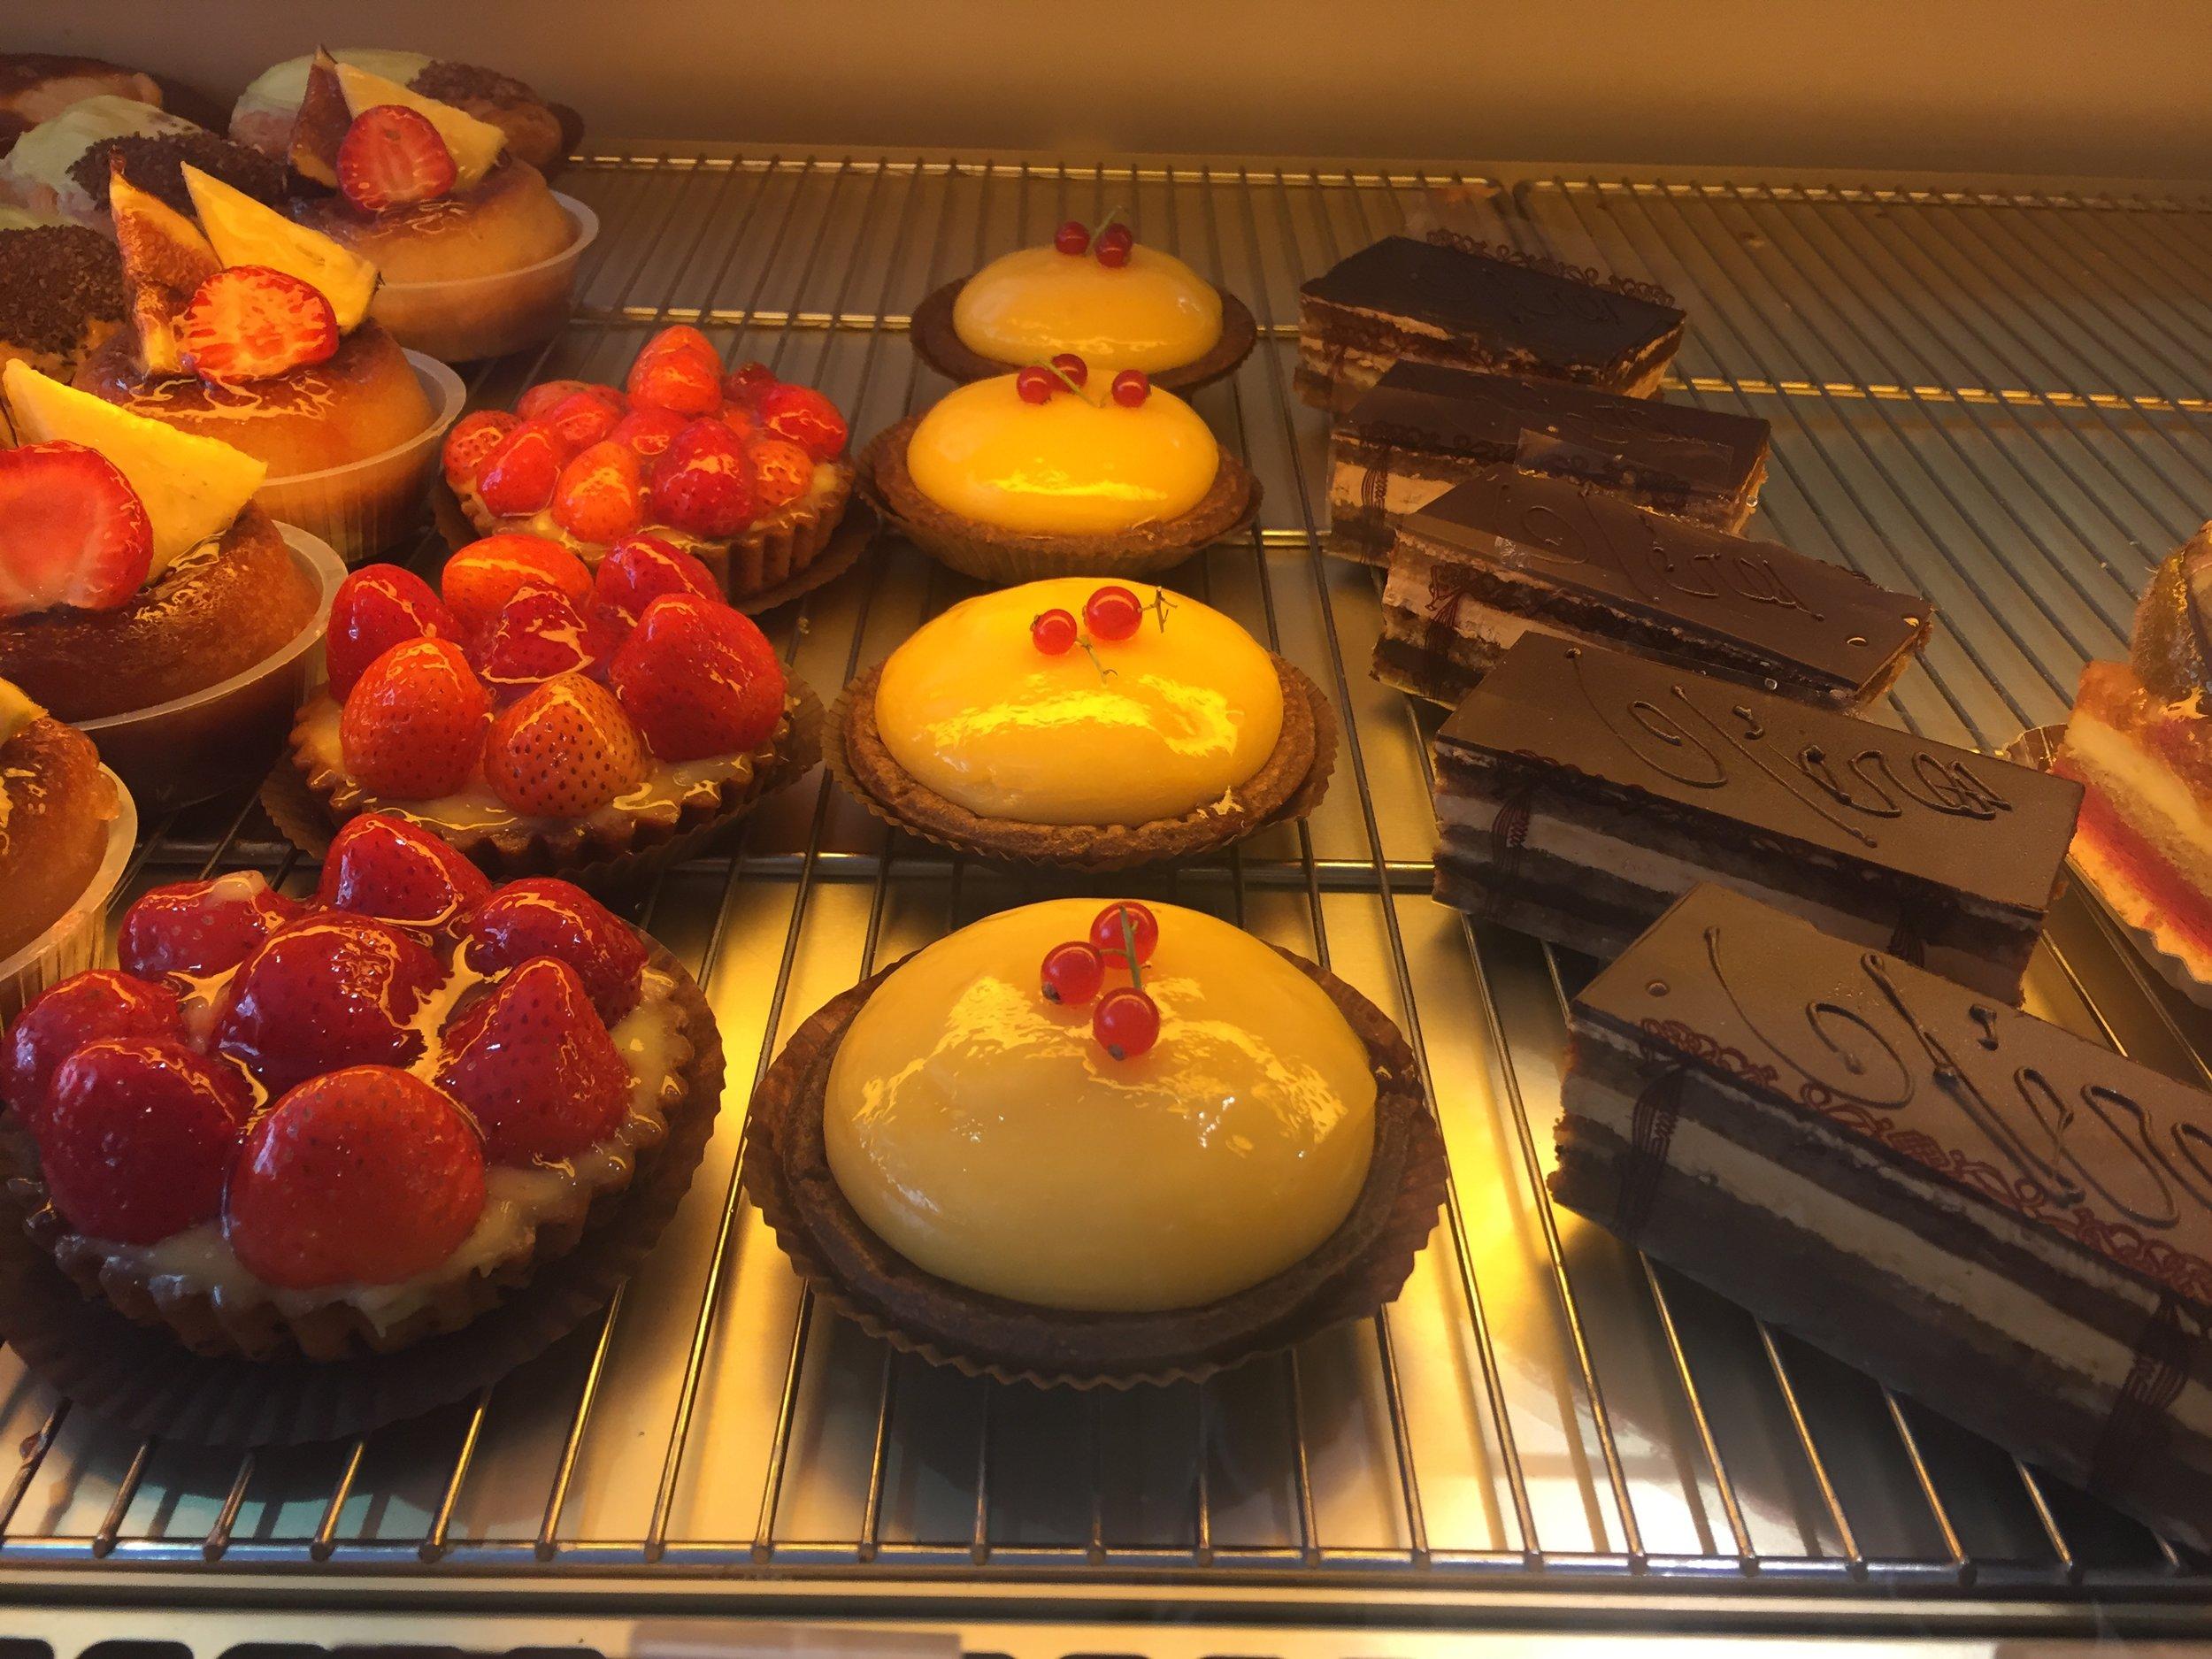 Paris Desserts - Eric Bravo Photography - Let's Go Bravo